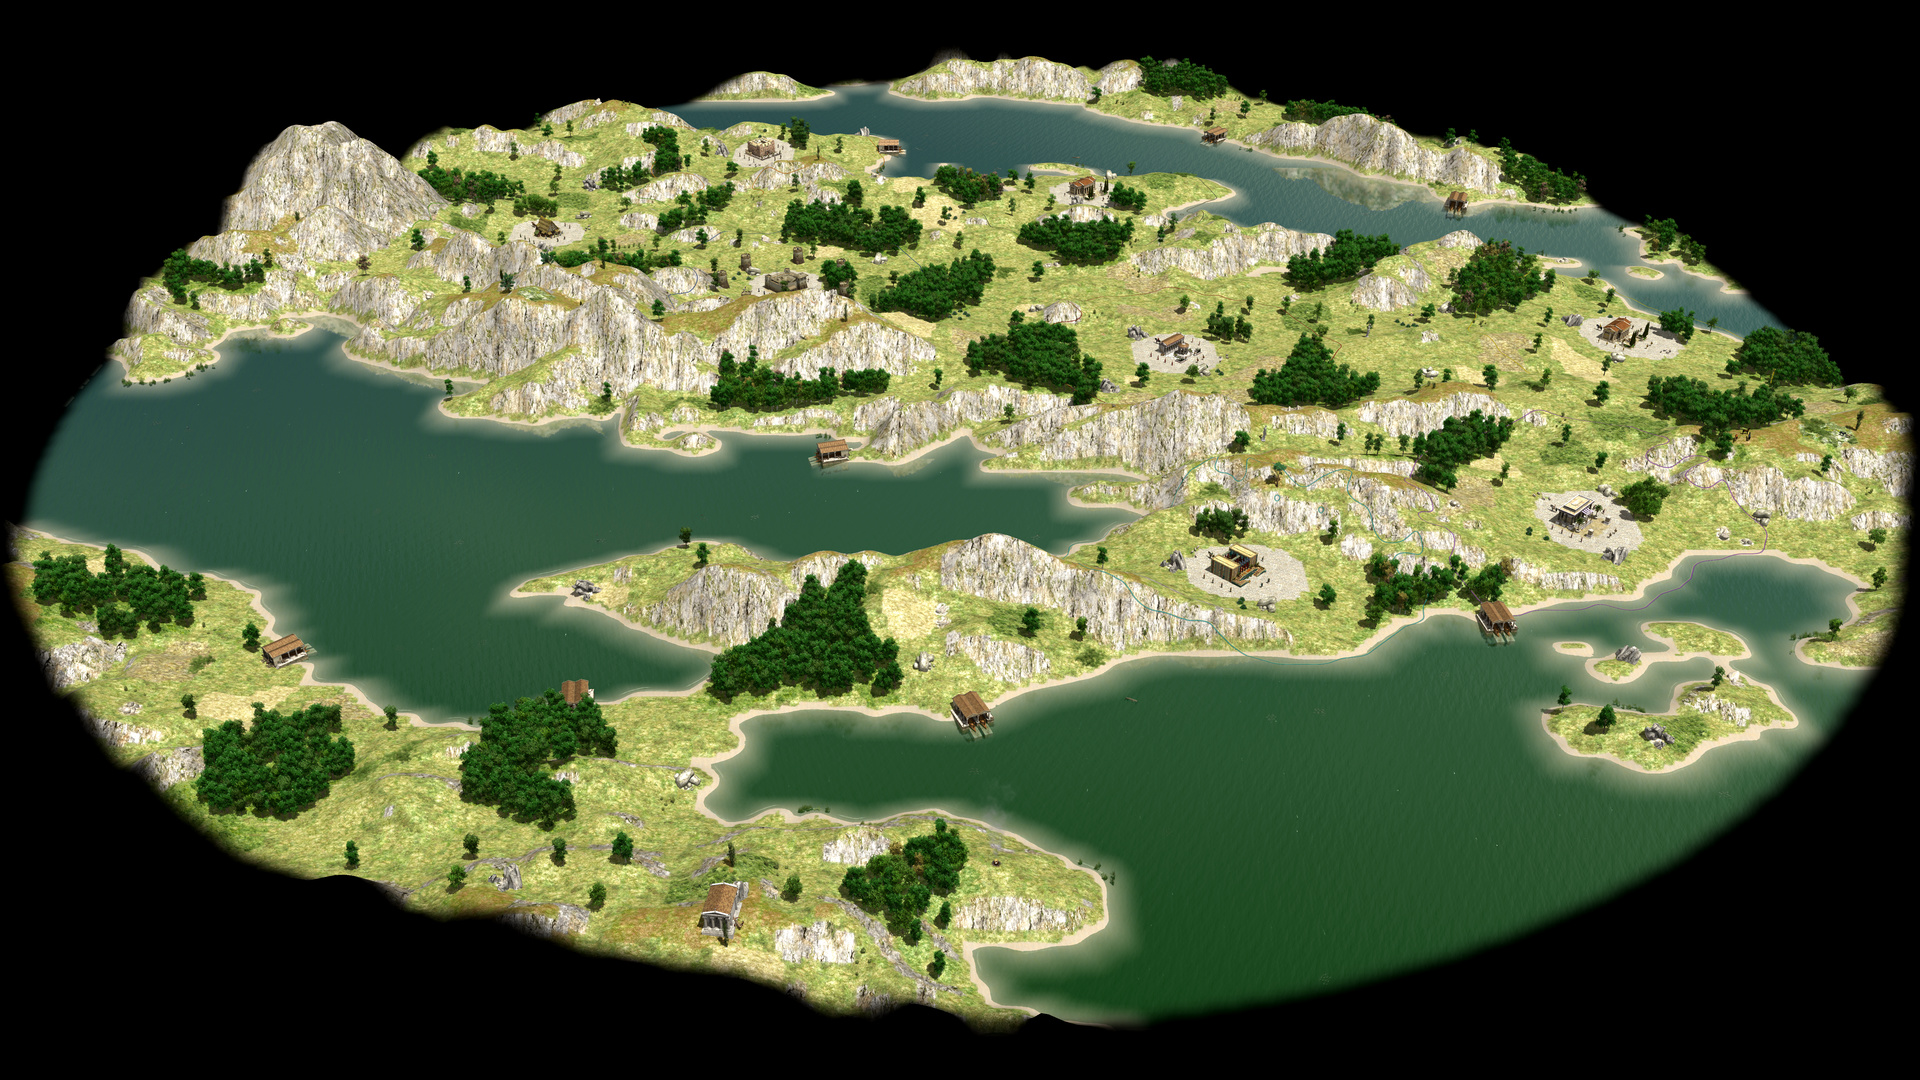 A u201cHellasu201d map generation showing a part